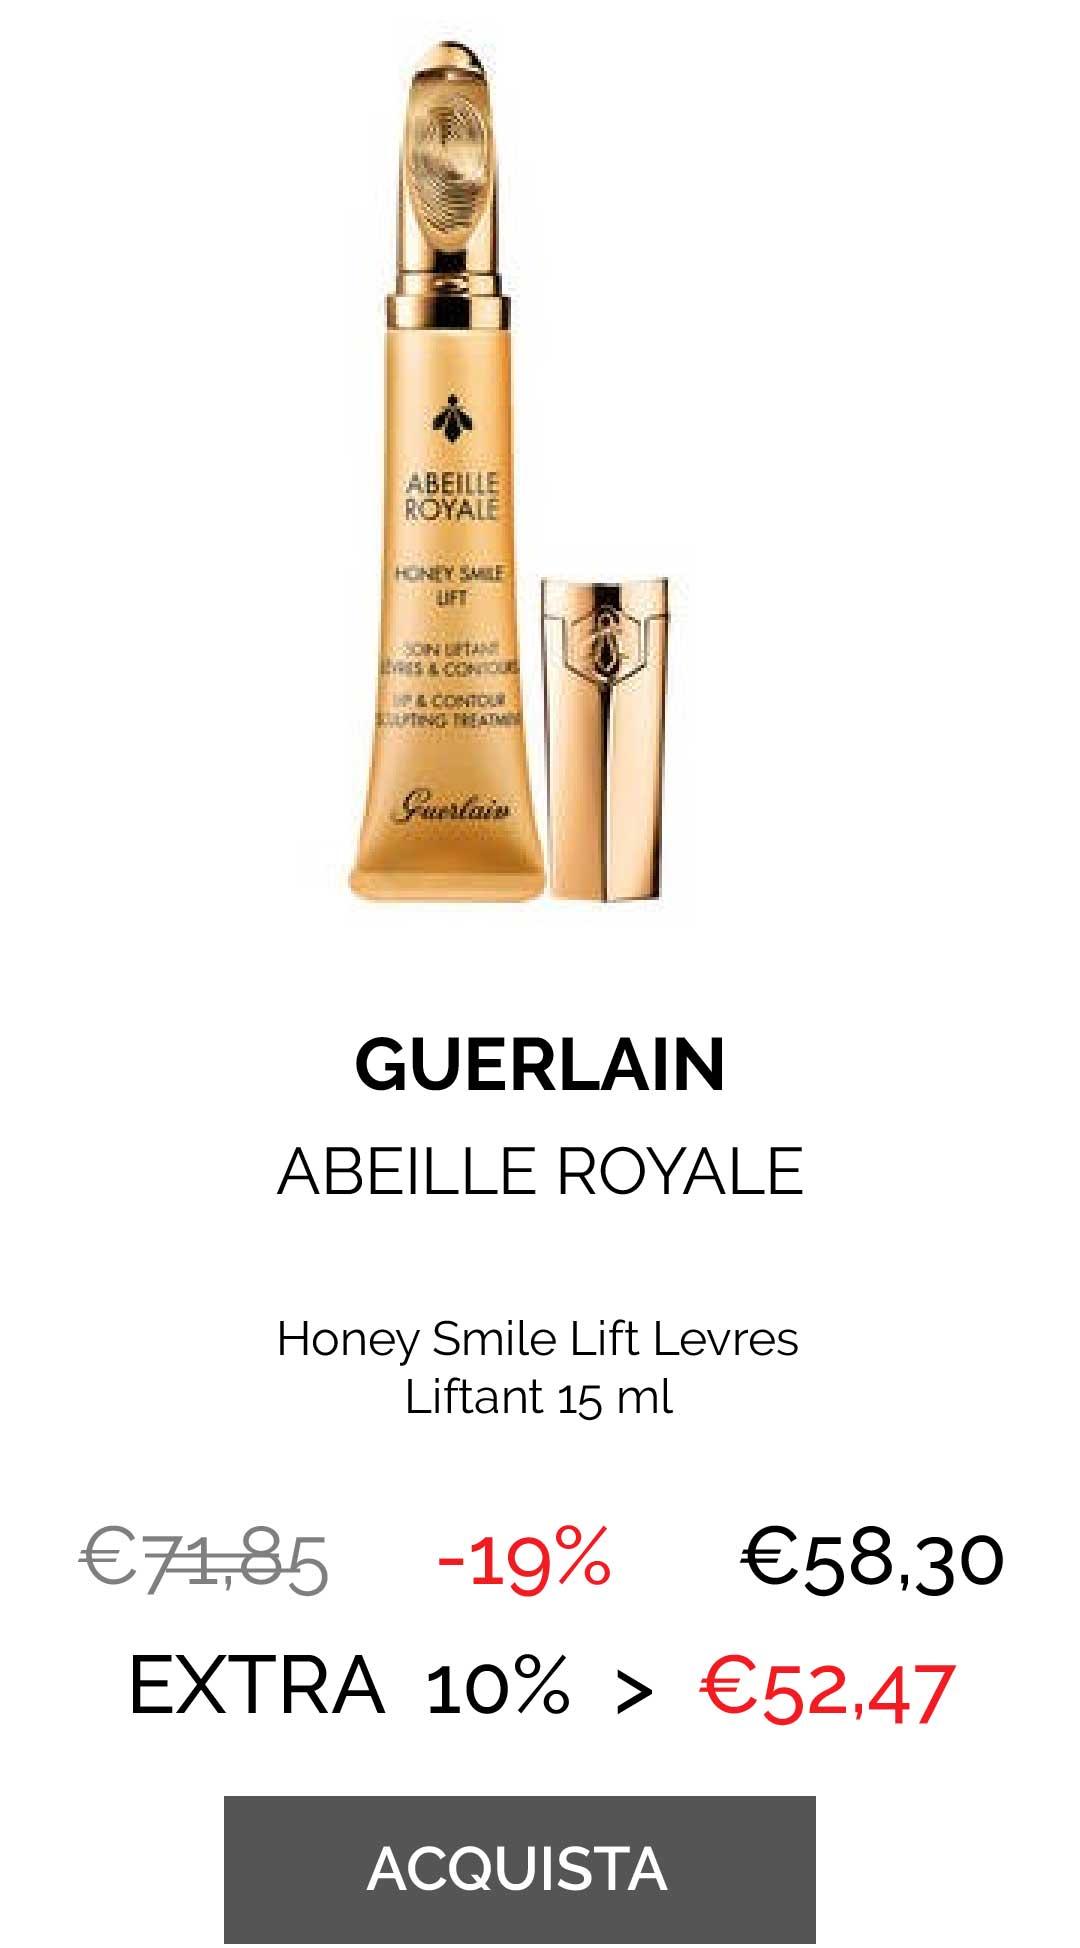 GUERLAIN - AB.ROYAL LEVRES LIFTANT 15 ML